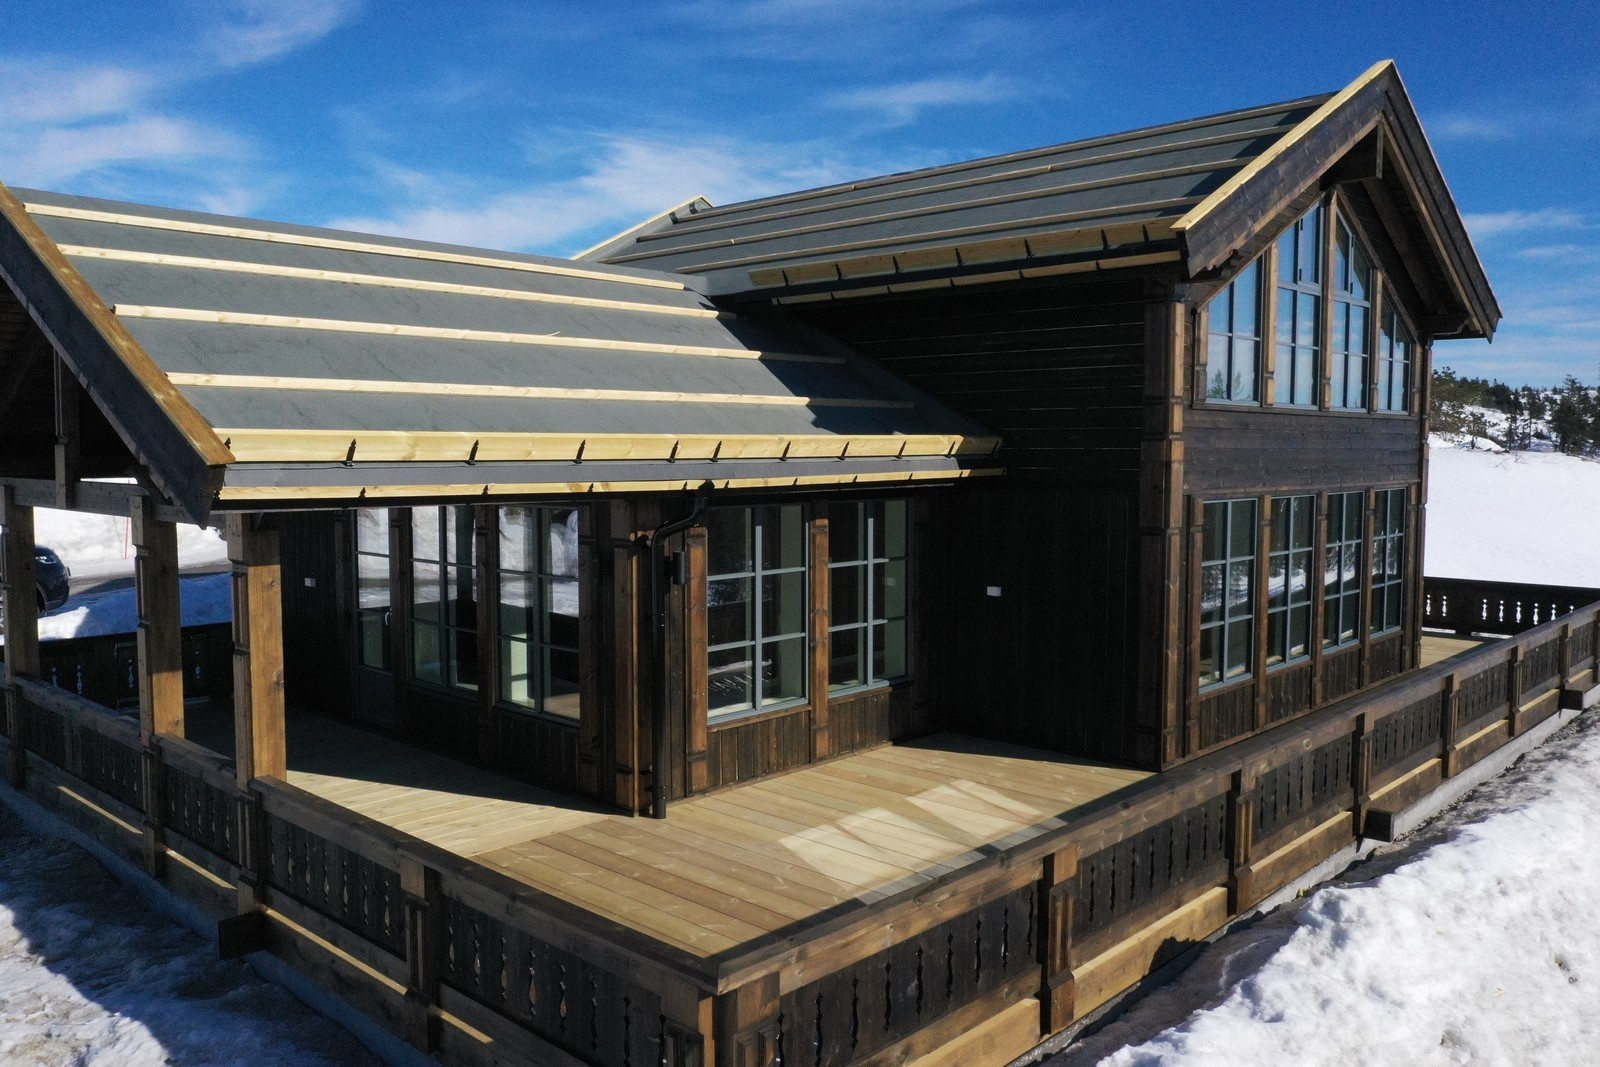 Tilsvarende hytte som er under bygging